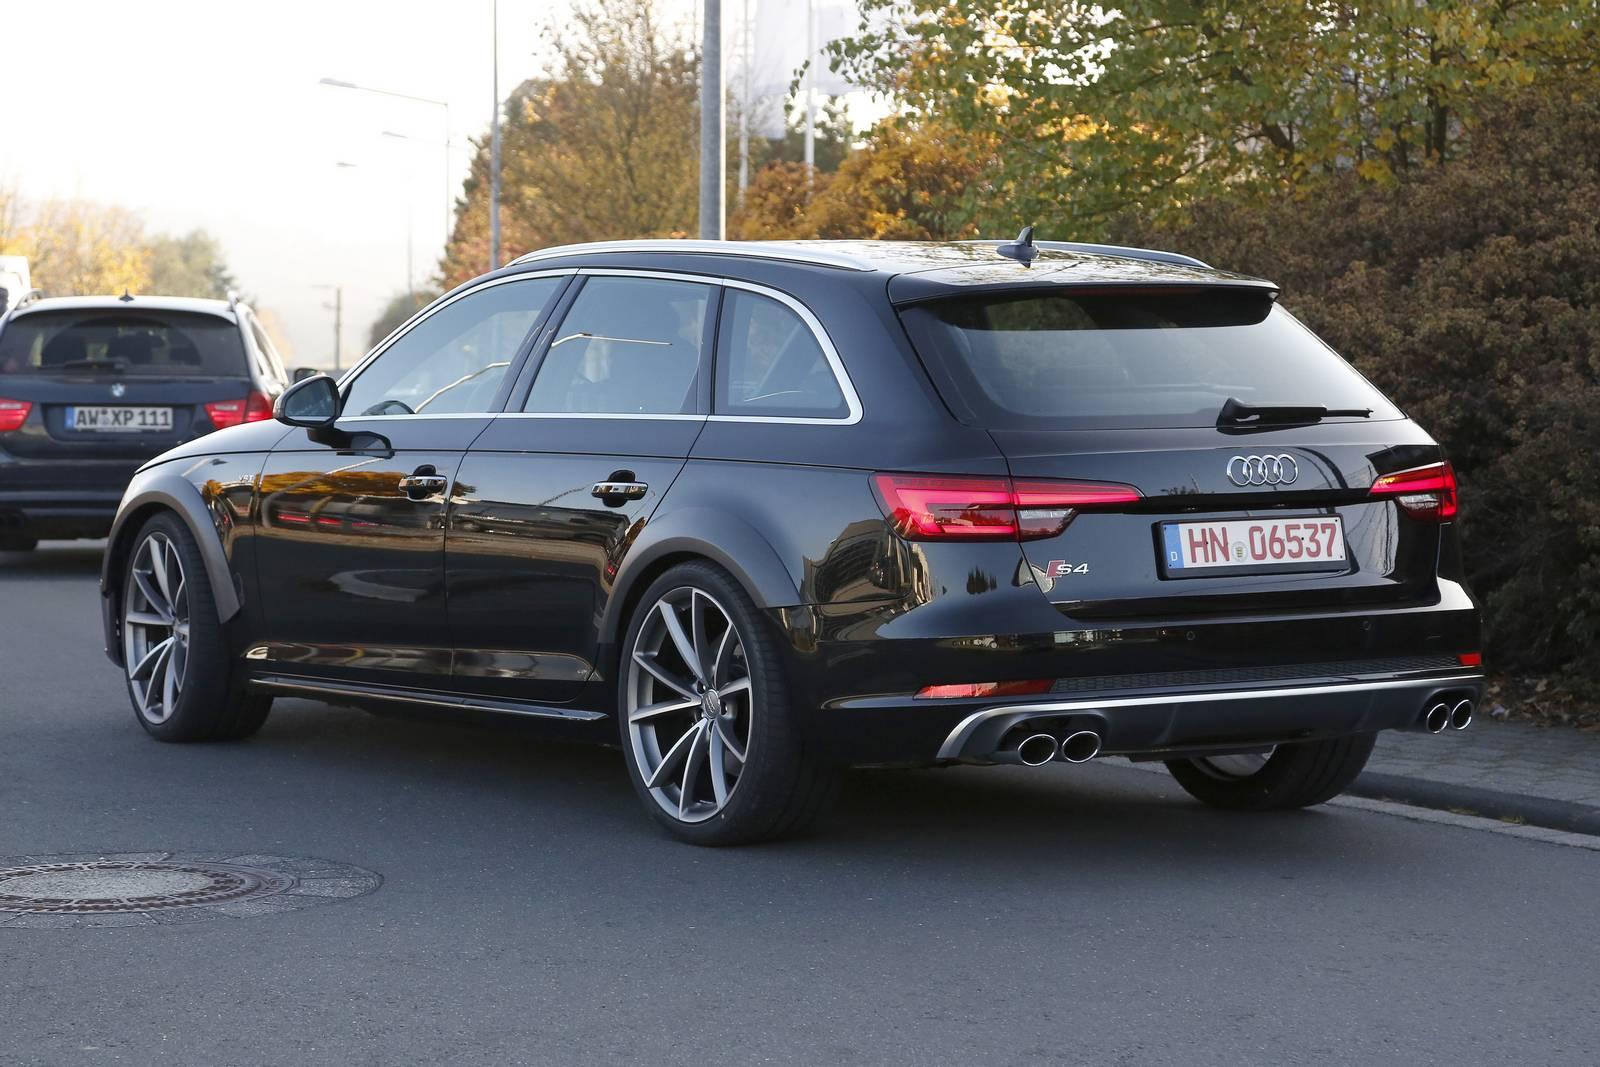 2018 Audi Rs4 Avant Test Mule Spy Shots Gtspirit